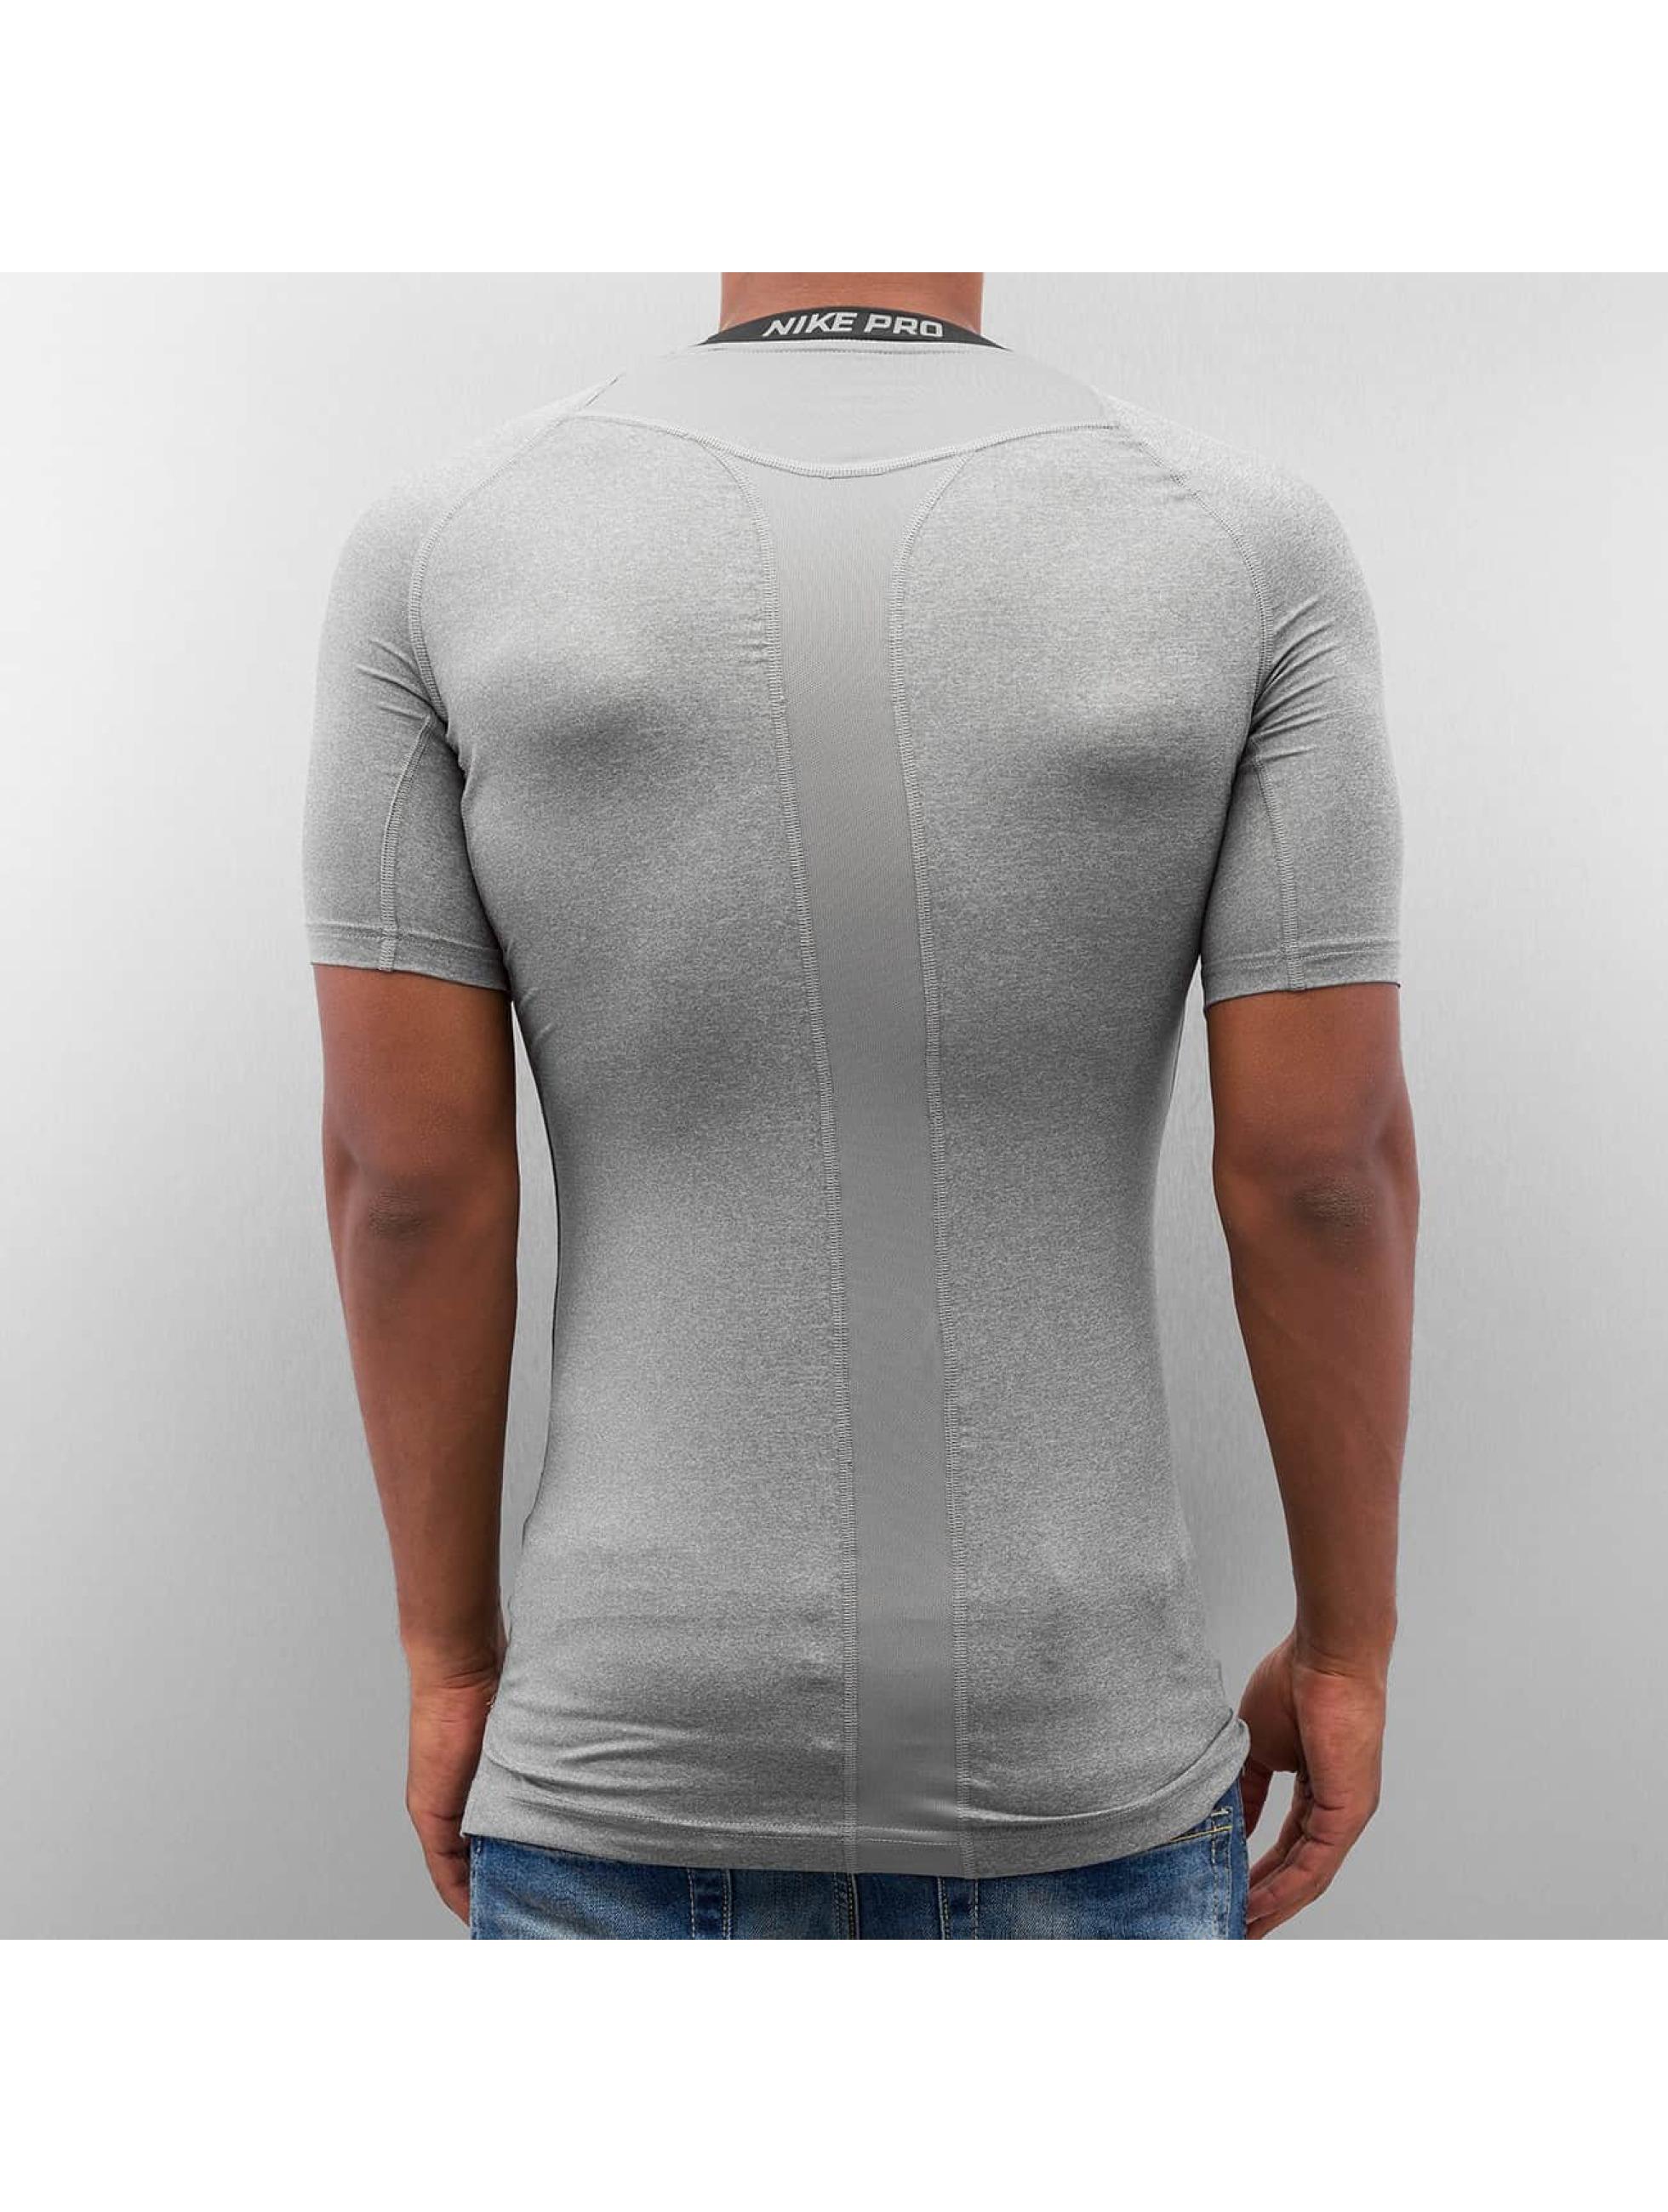 Nike Performance T-Shirt Pro Cool Compression grau